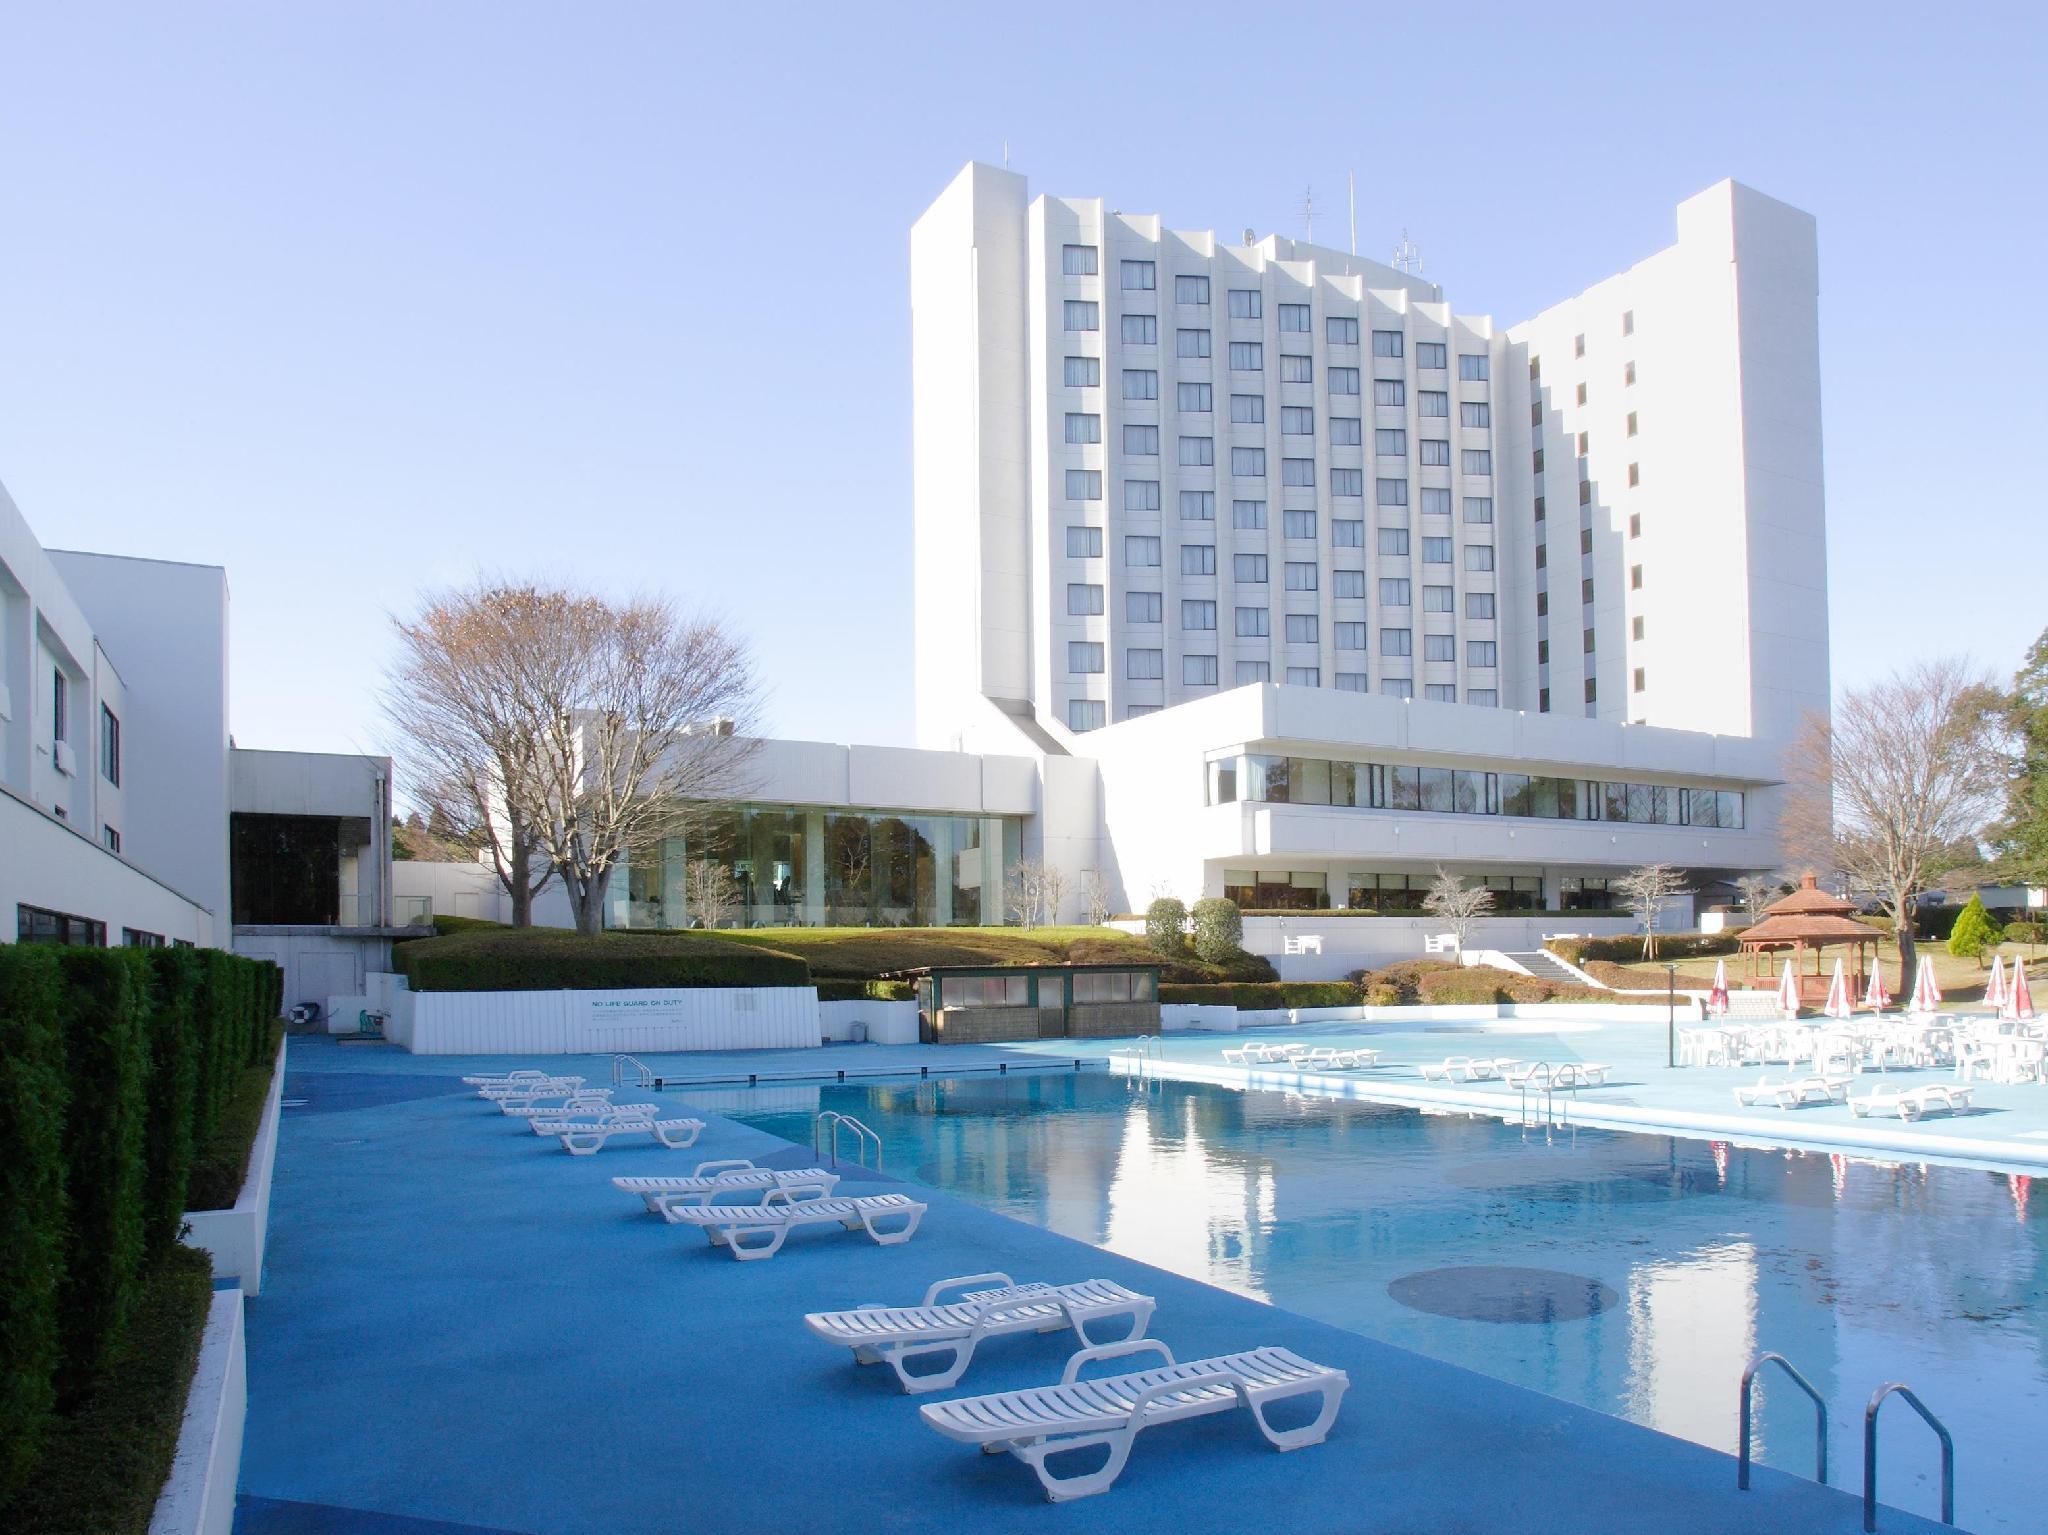 Chiba radisson hotel narita in japan asia for Radisson hotel